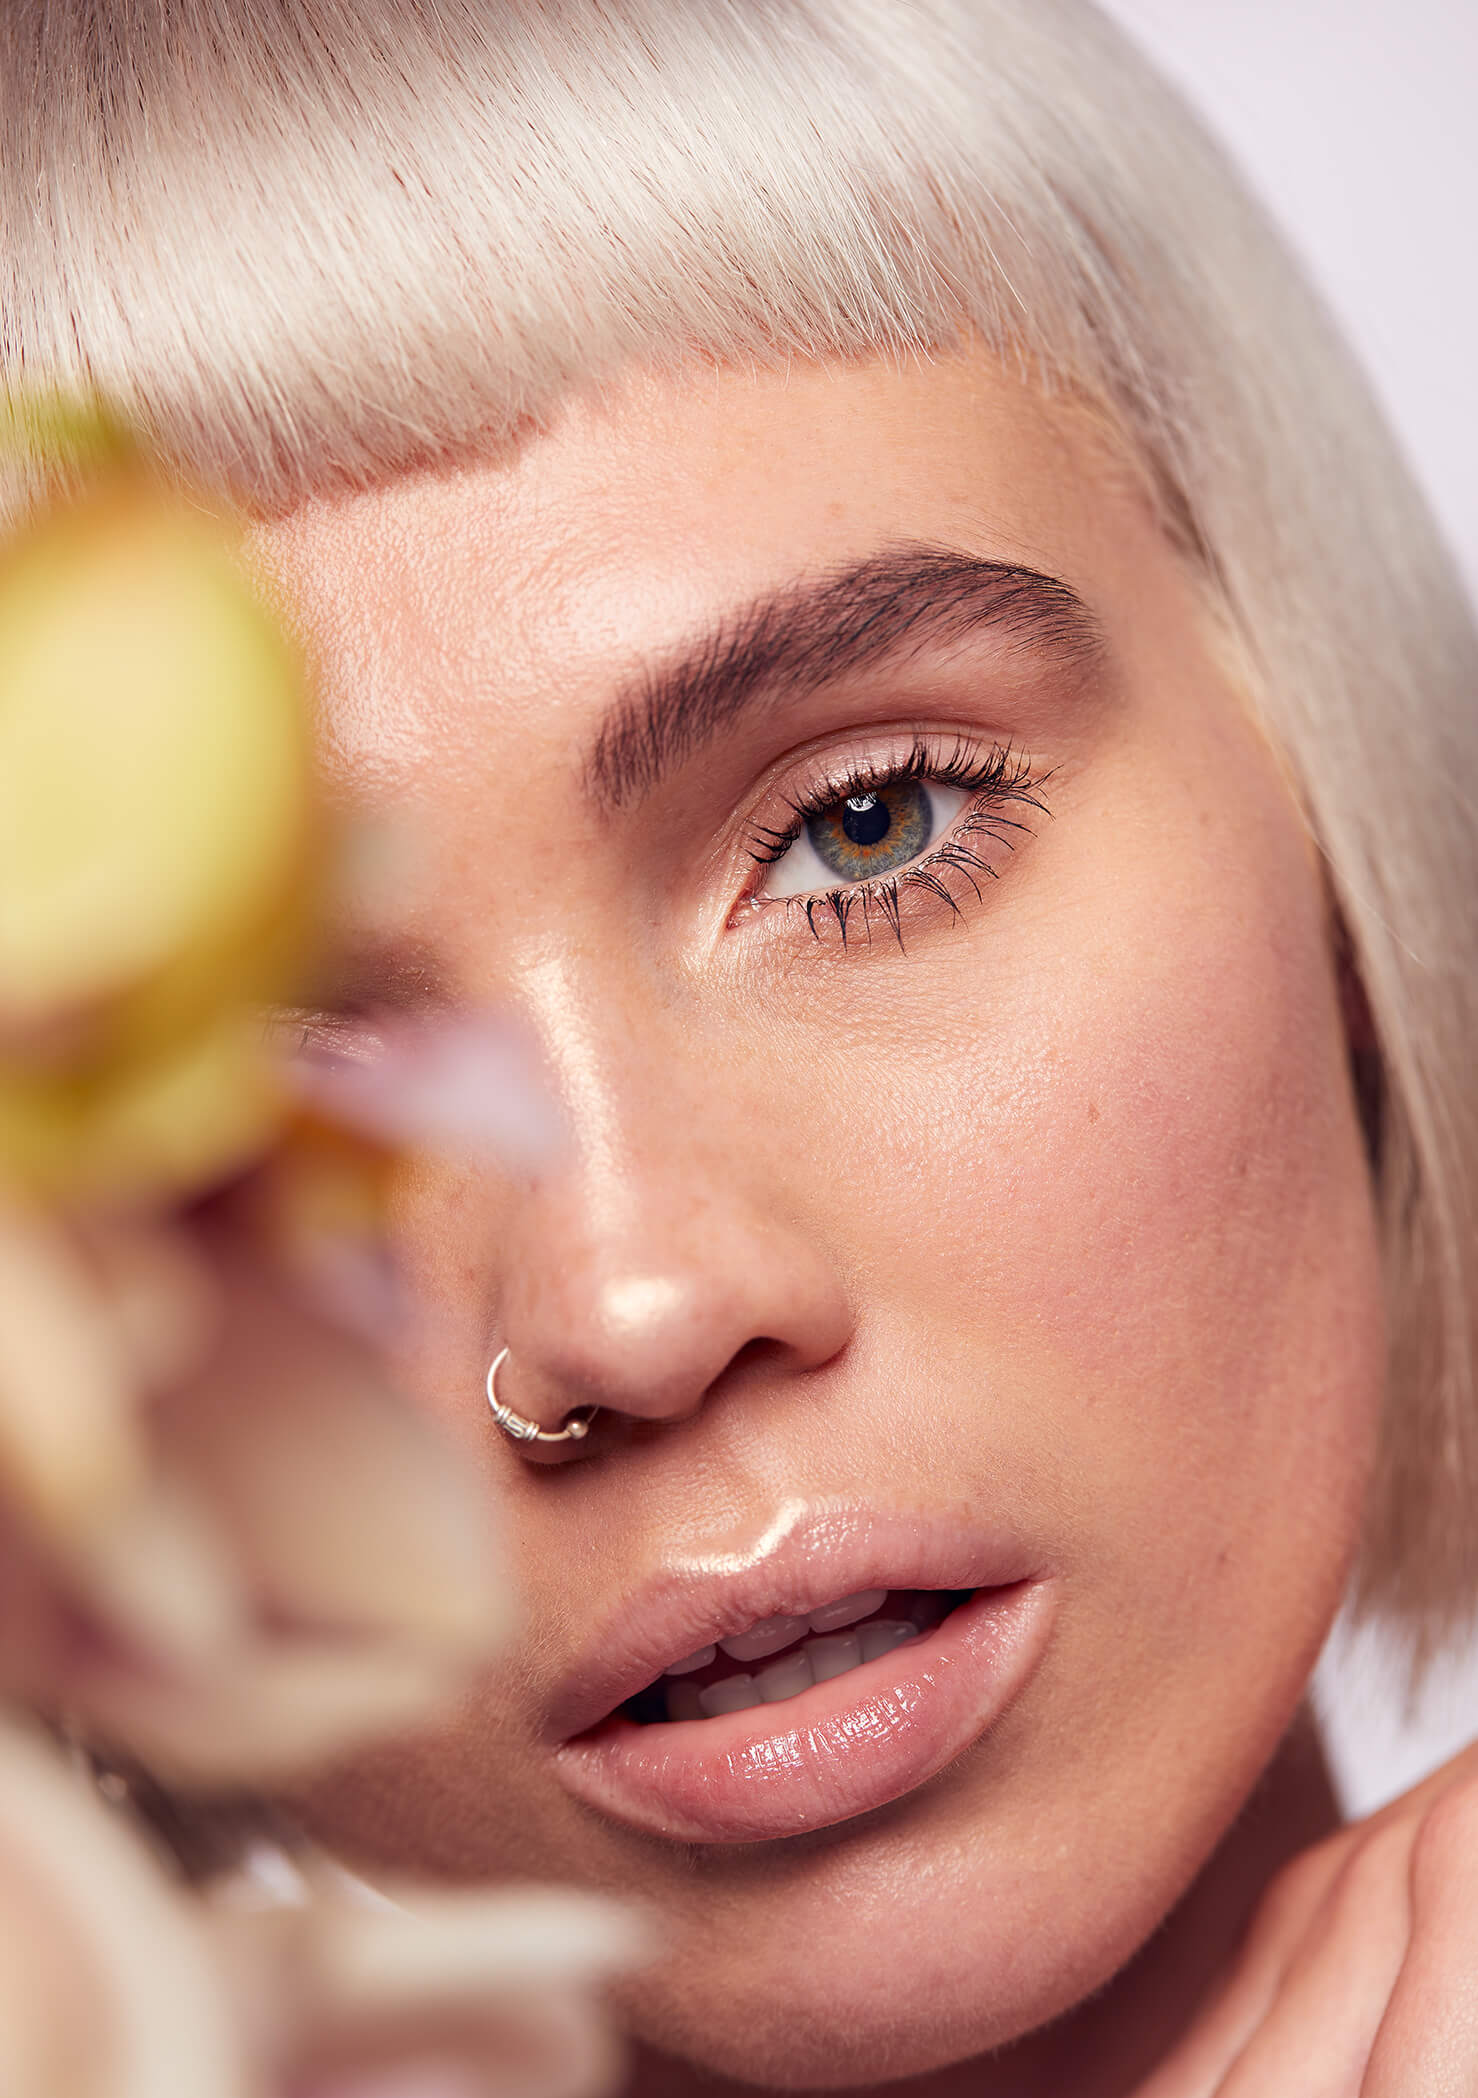 Beauty_Test_Shoot_RESIZED3.jpg